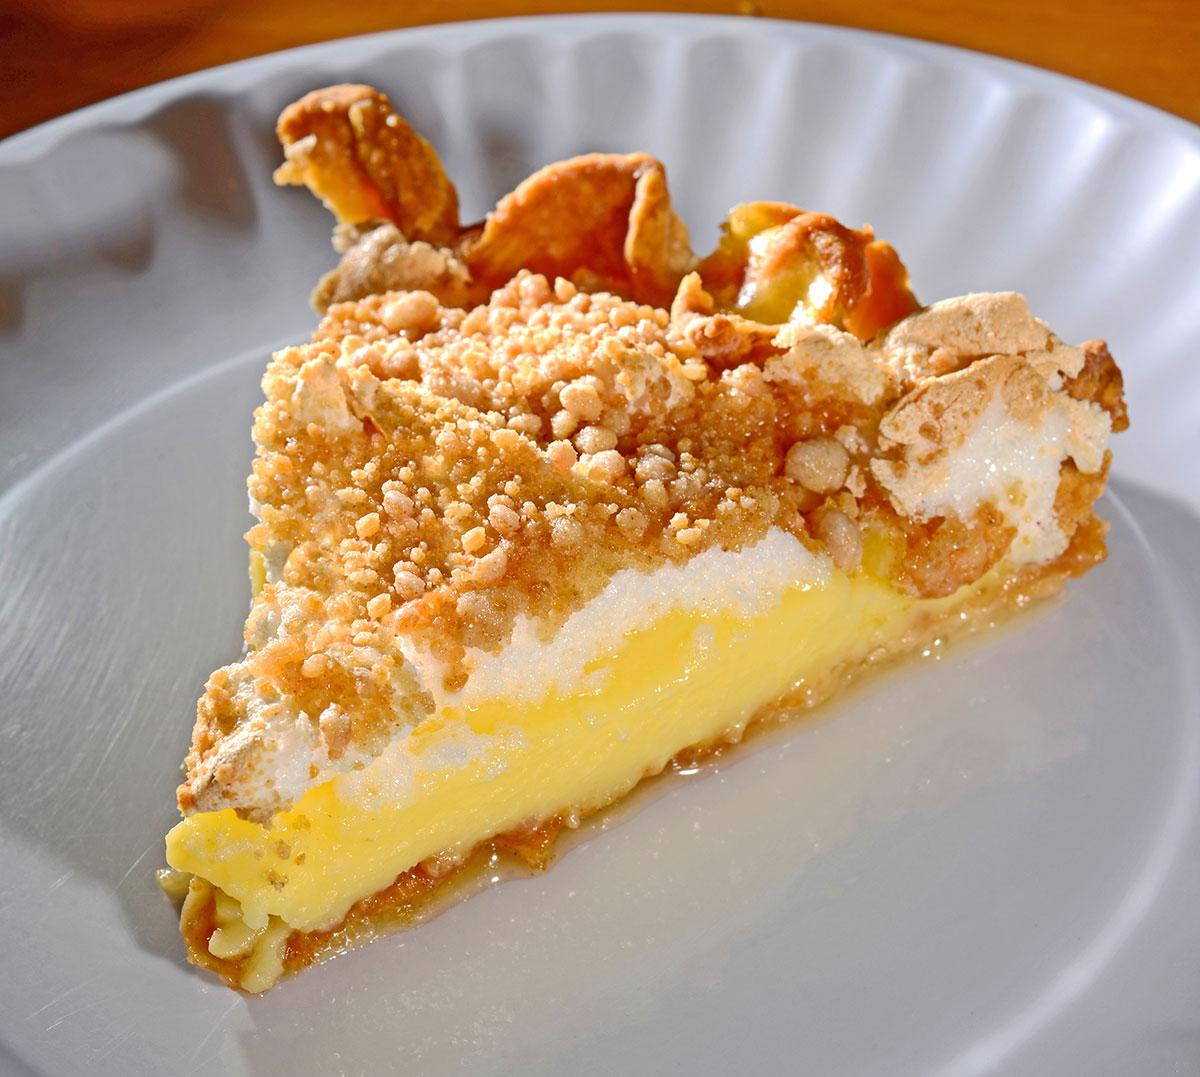 Elna Simonsen's Peanut Butter Pie